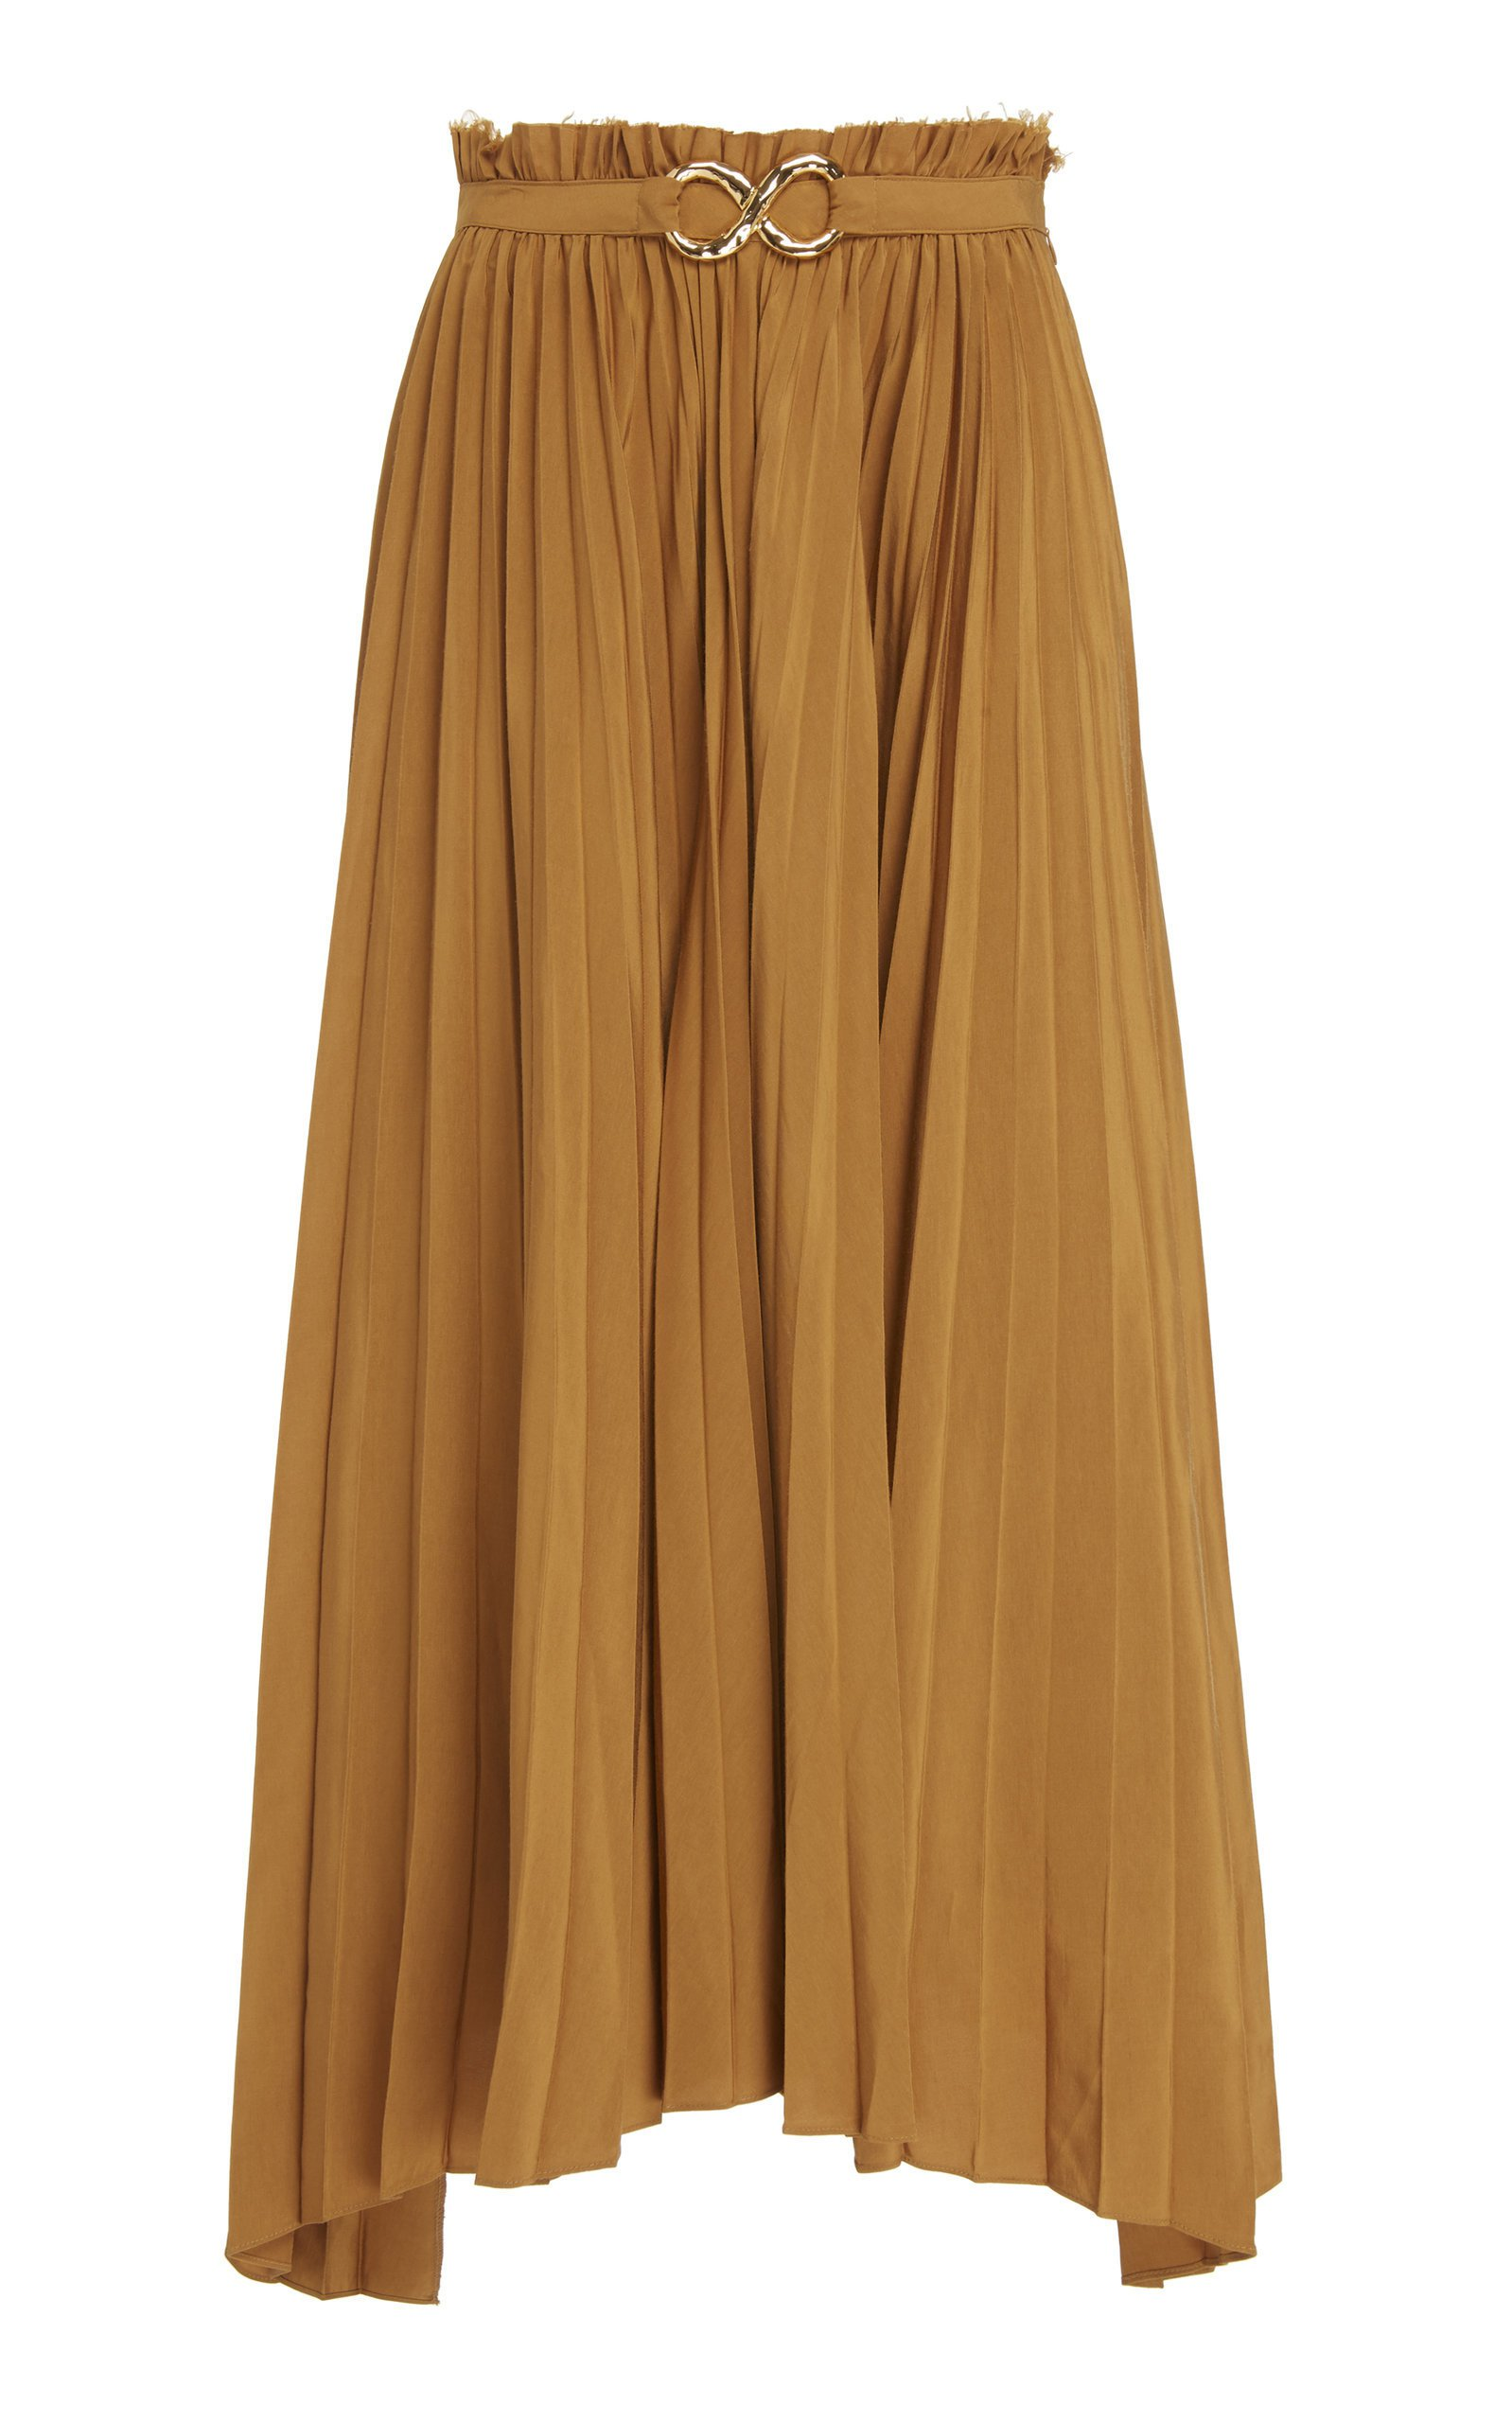 Rejina Pyo Kiera Pleated Satin Midi Skirt Size: 6